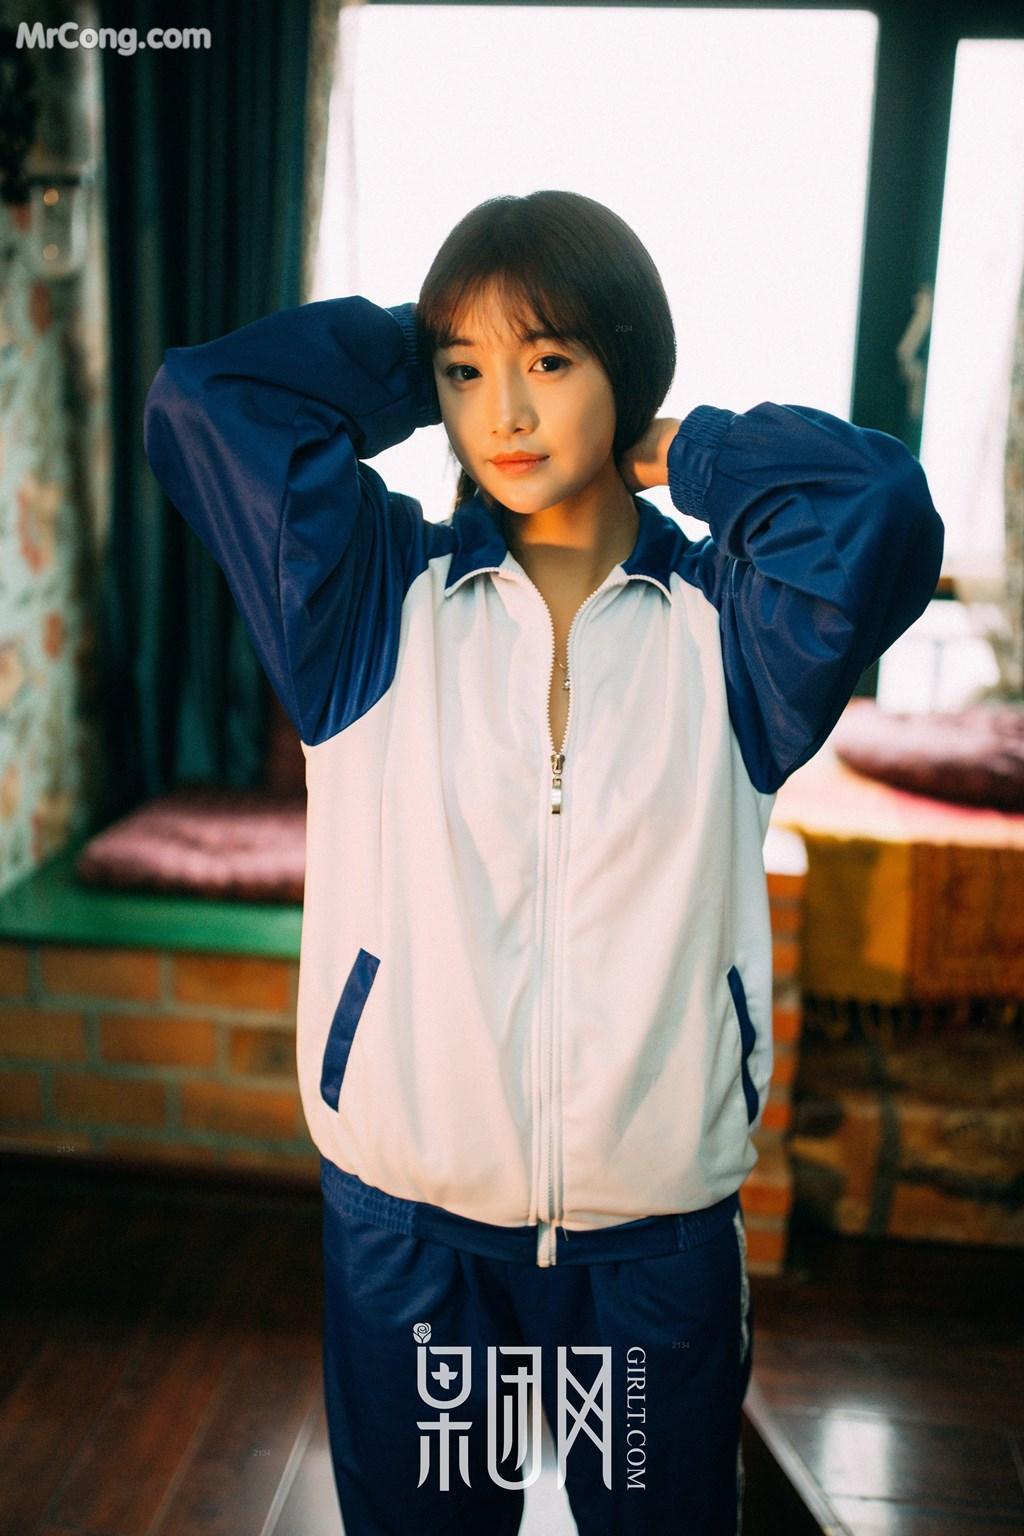 Image GIRLT-XCJX-No.015-MrCong.com-001 in post GIRLT XCJX No.015 (51 ảnh)